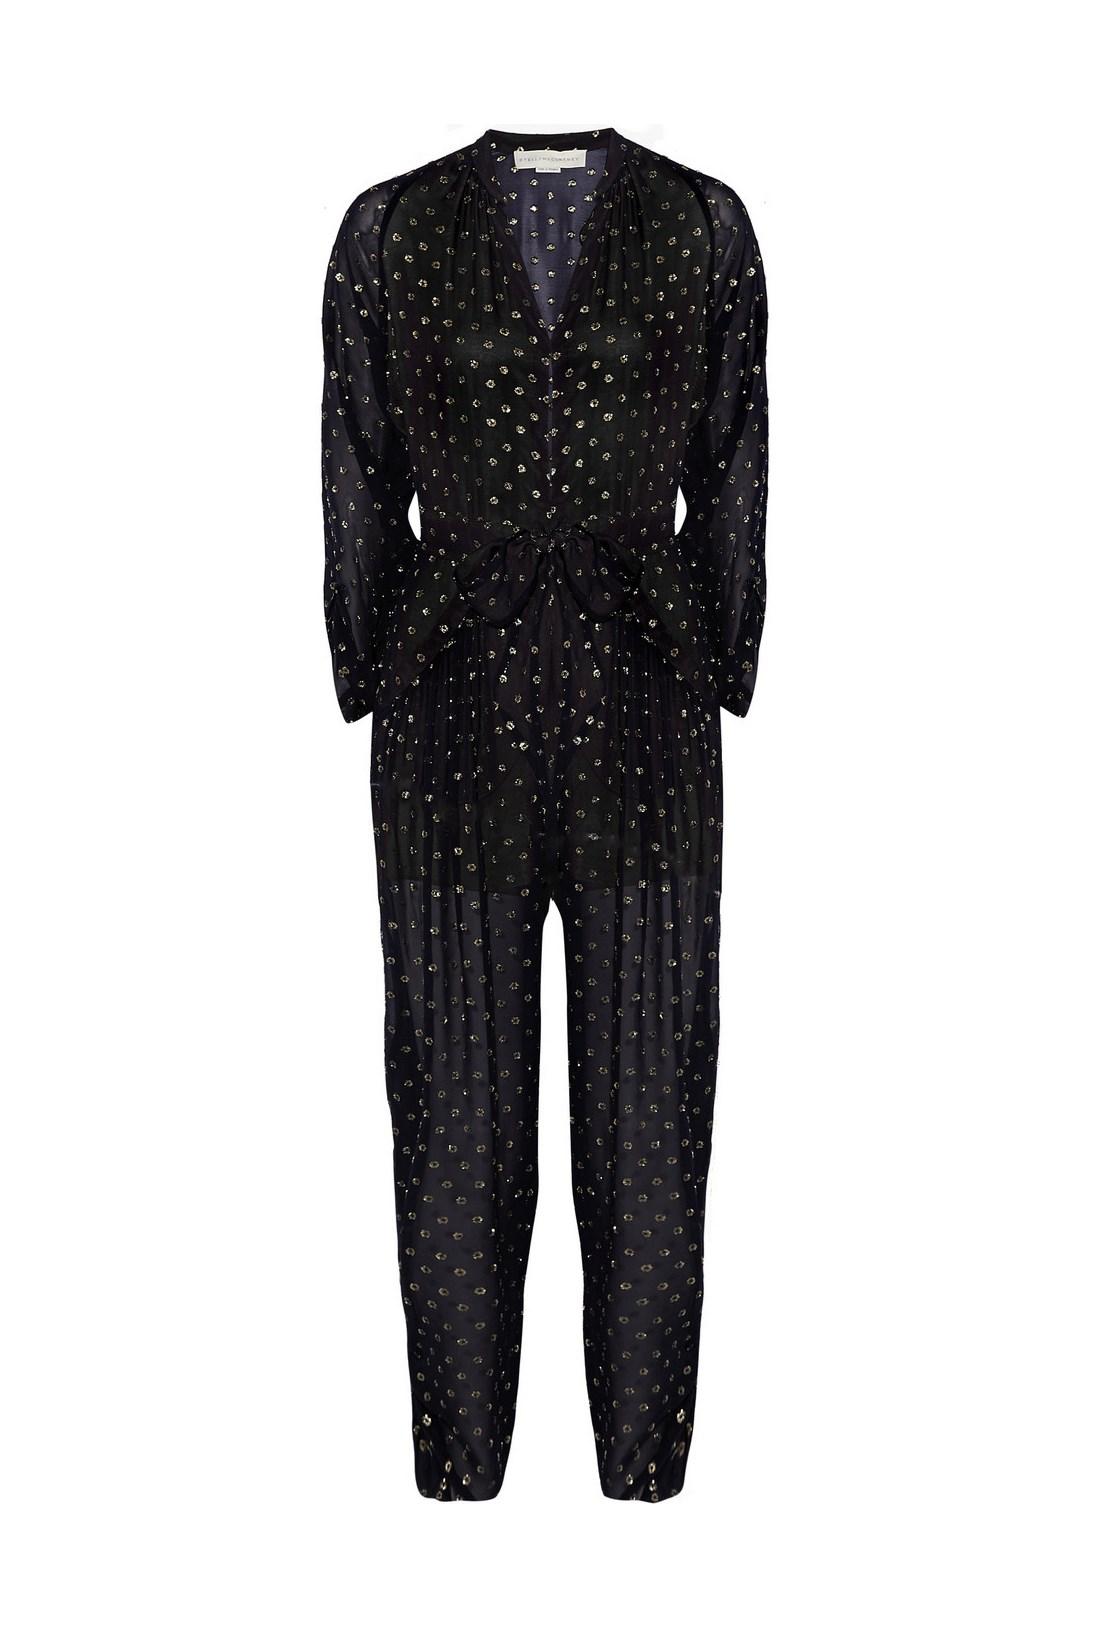 "Jumpsuit, $2,790, Stella McCartney, <a href=""http://www.net-a-porter.com/product/504612/Stella_McCartney/monia-silk-blend-fil-coupe-jumpsuit"">net-a-porter.com</a>"